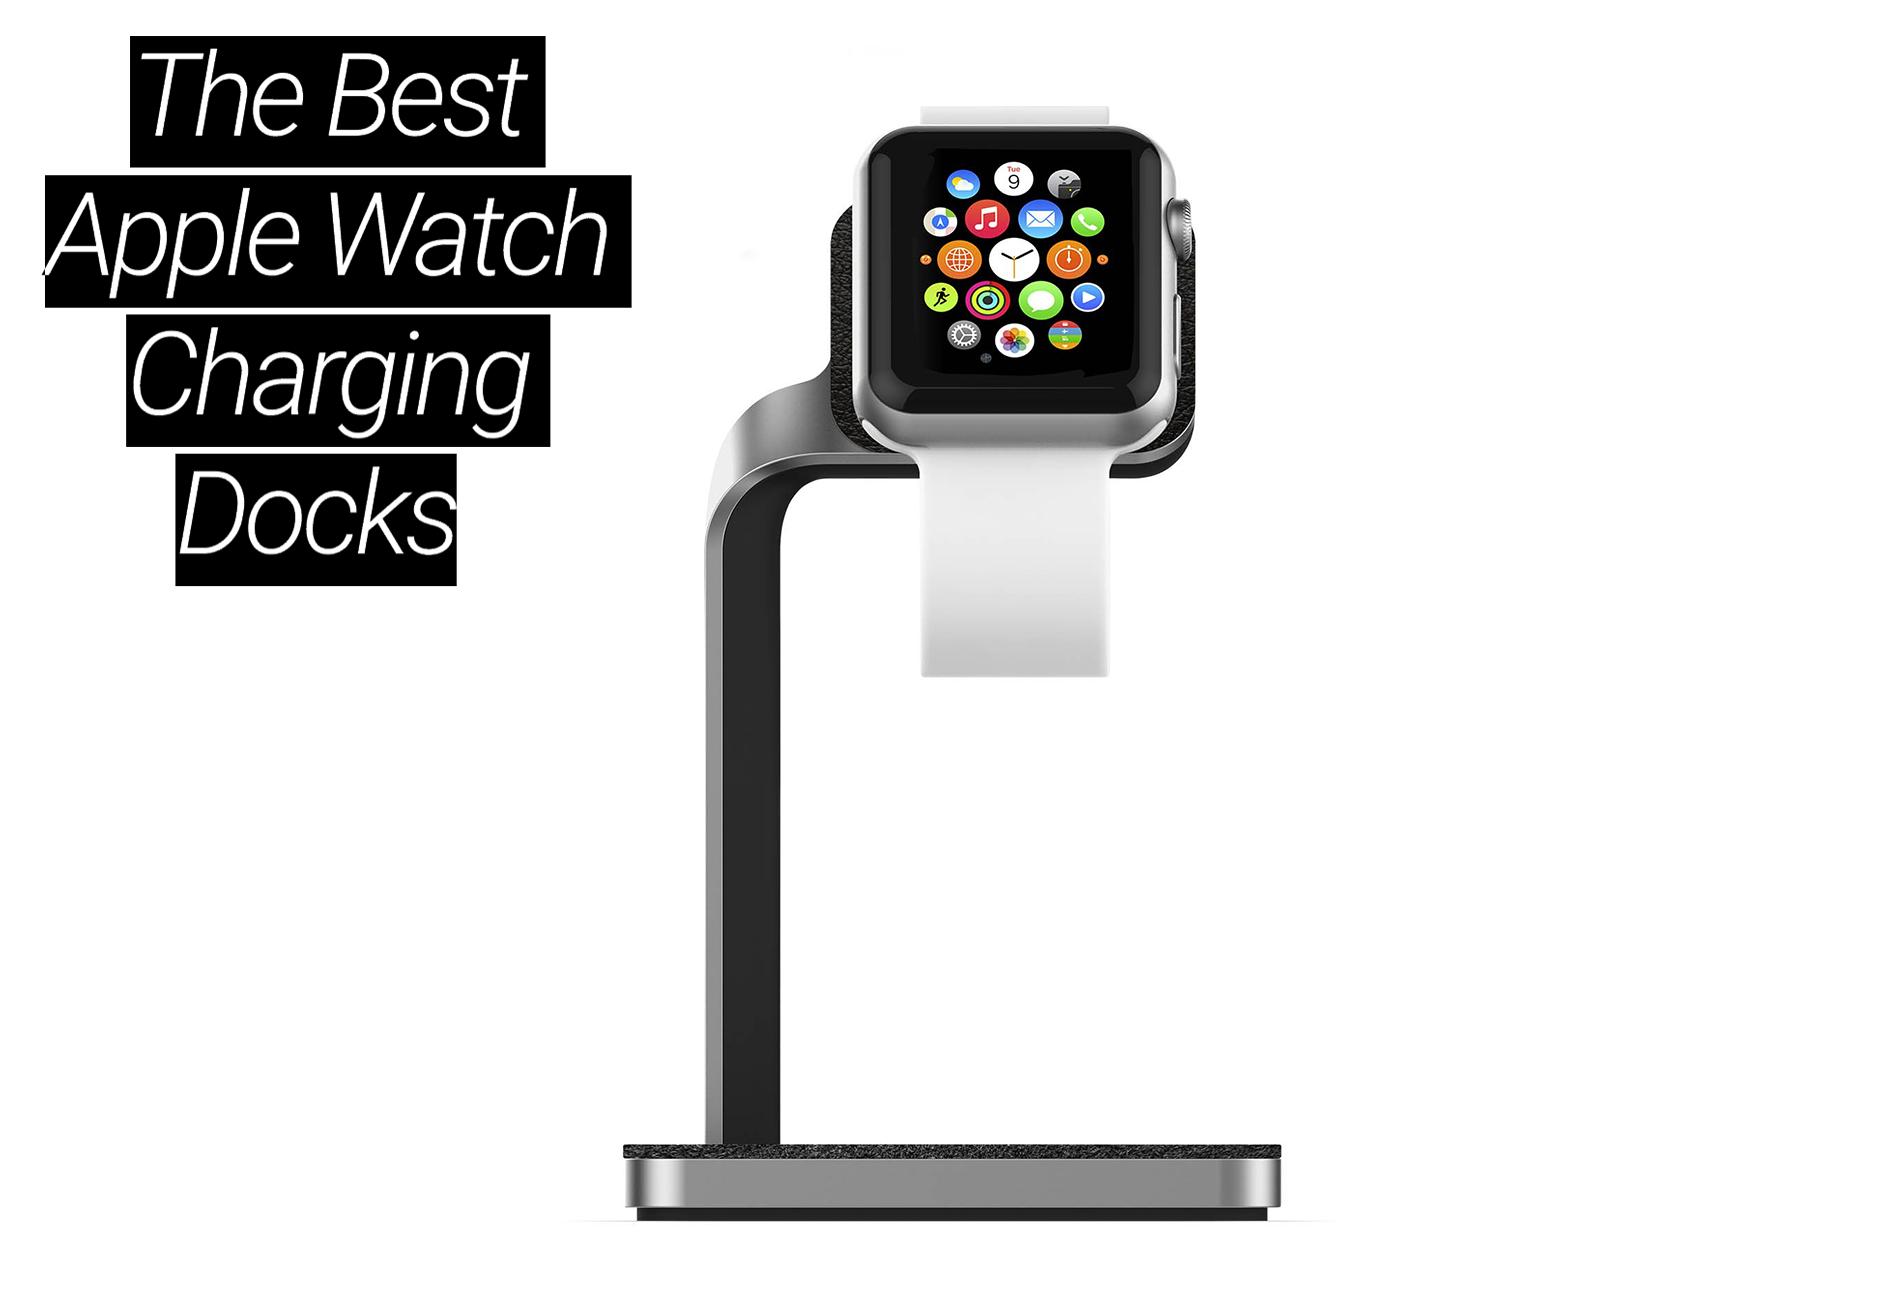 the-best-apple-watch-charging-docks